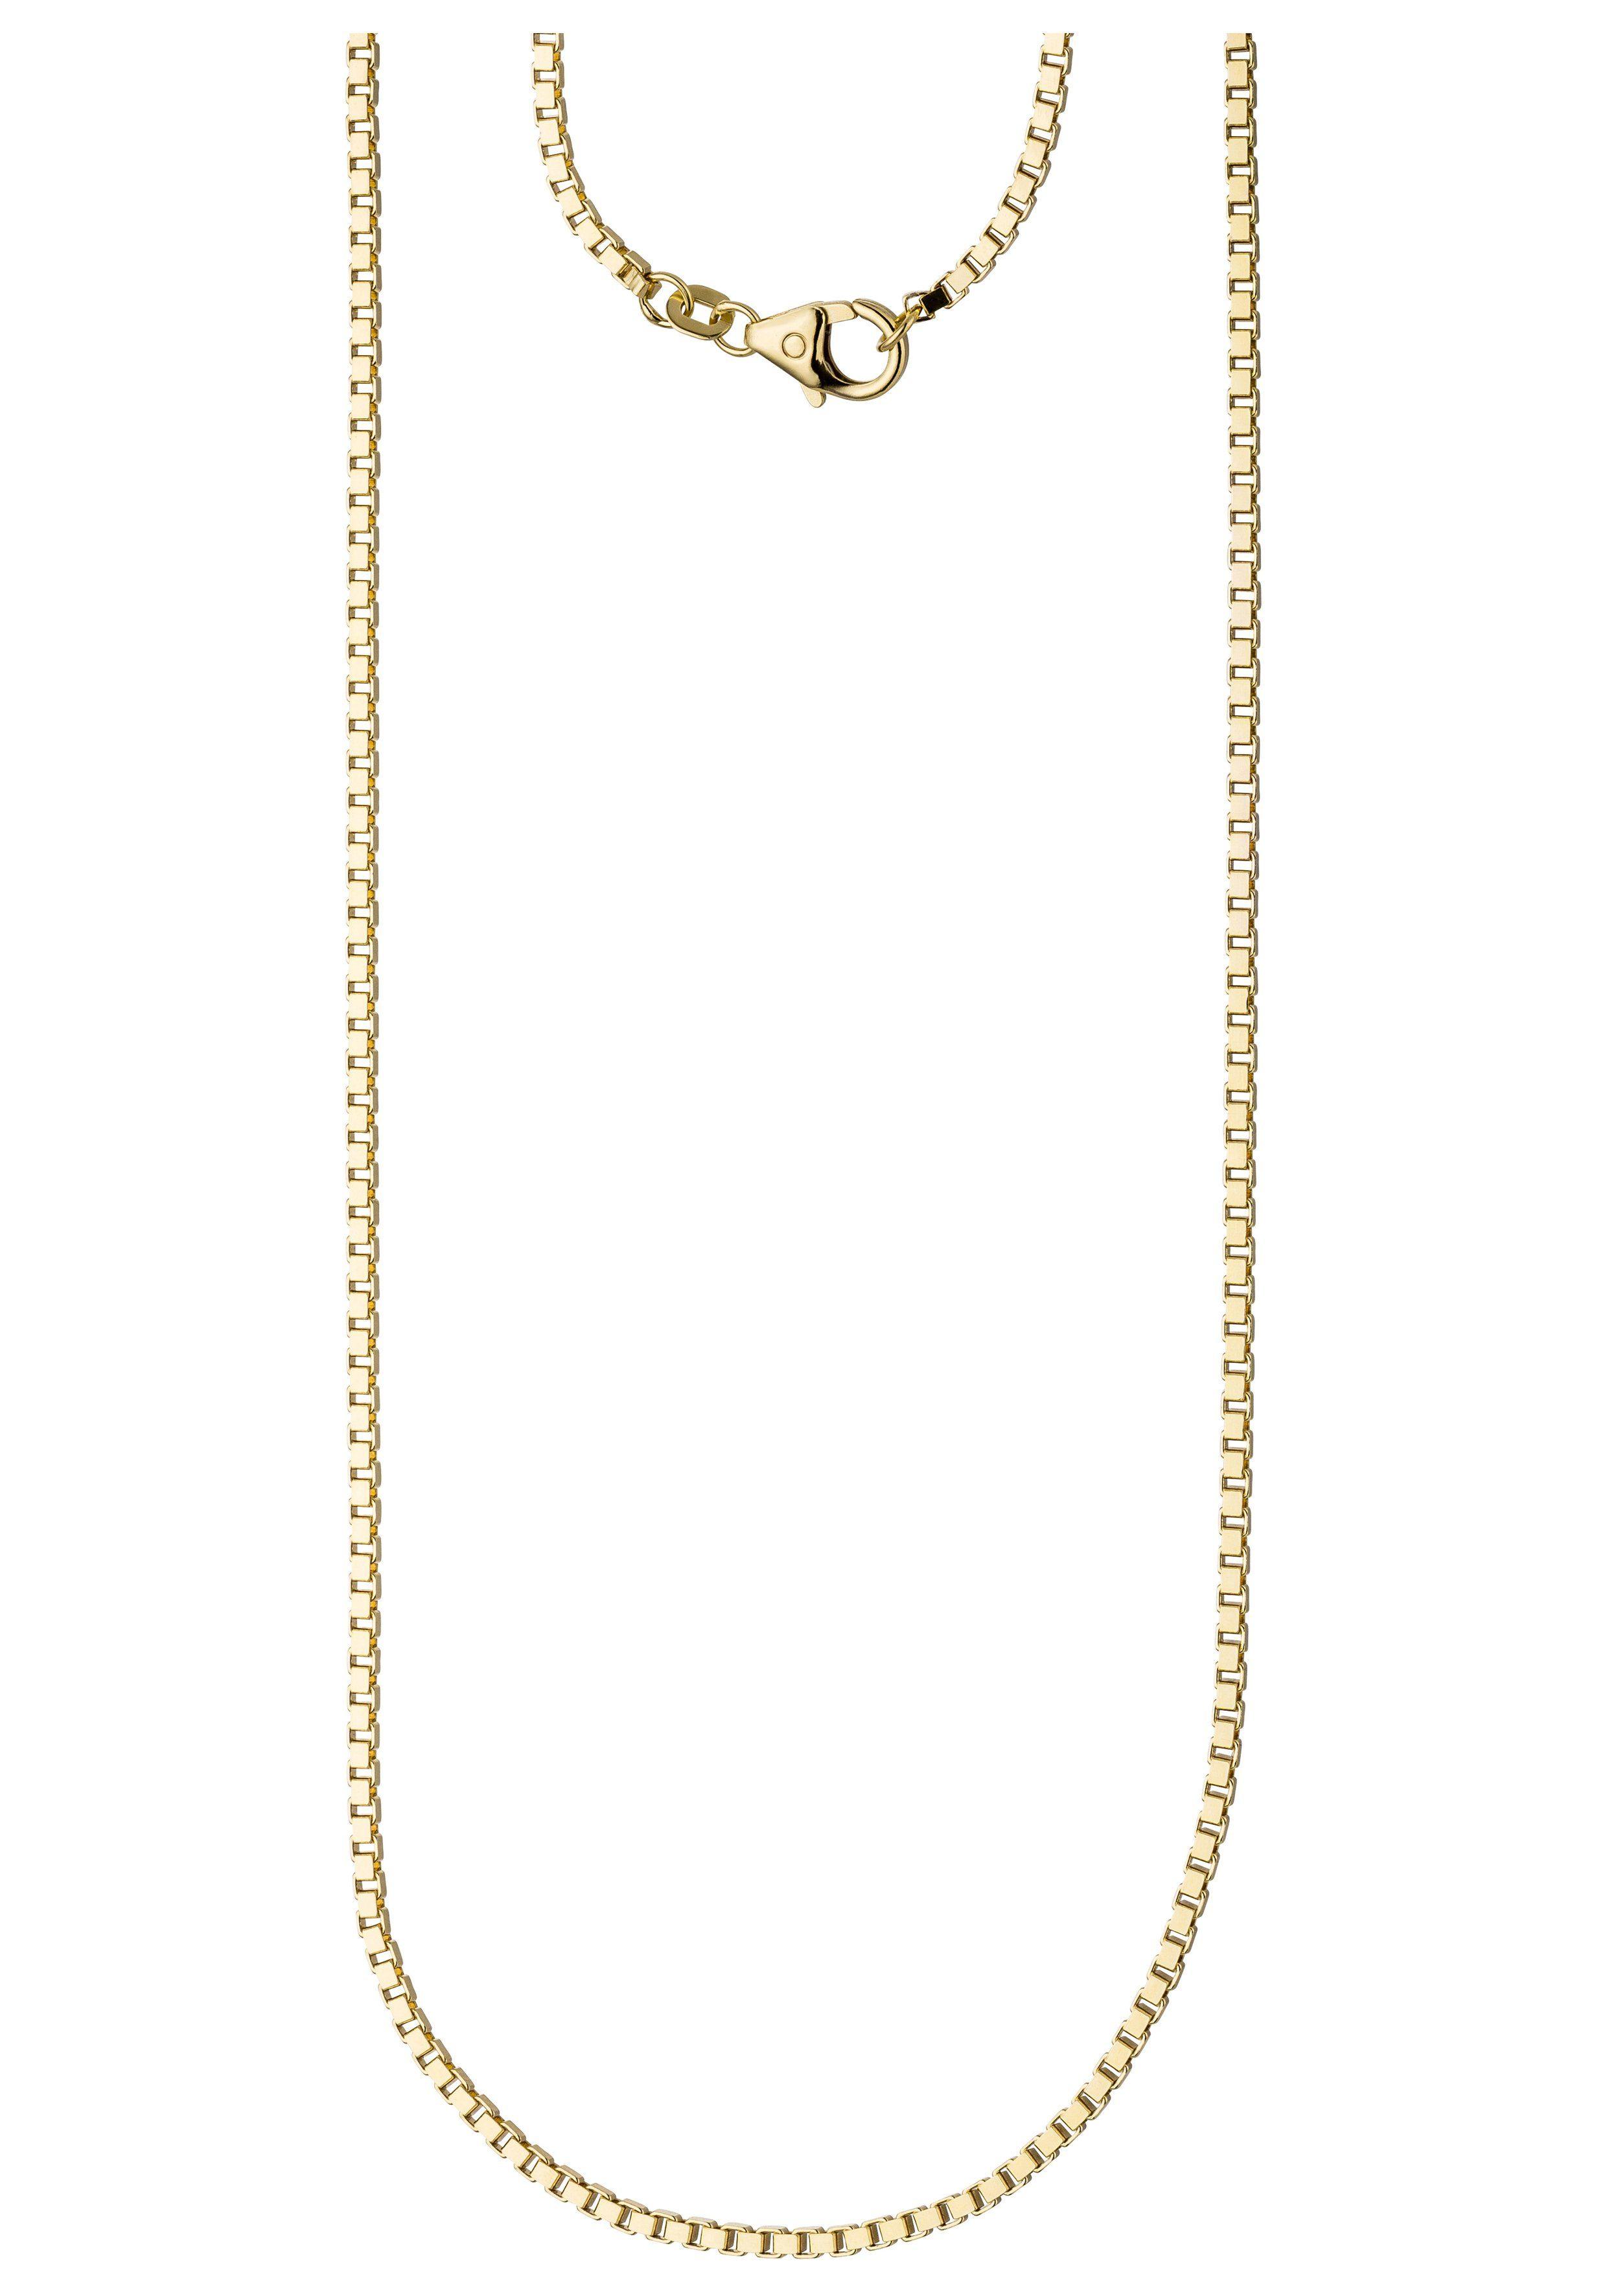 JOBO Goldkette Venezianerkette 585 Gold diamantiert 60 cm 2 mm